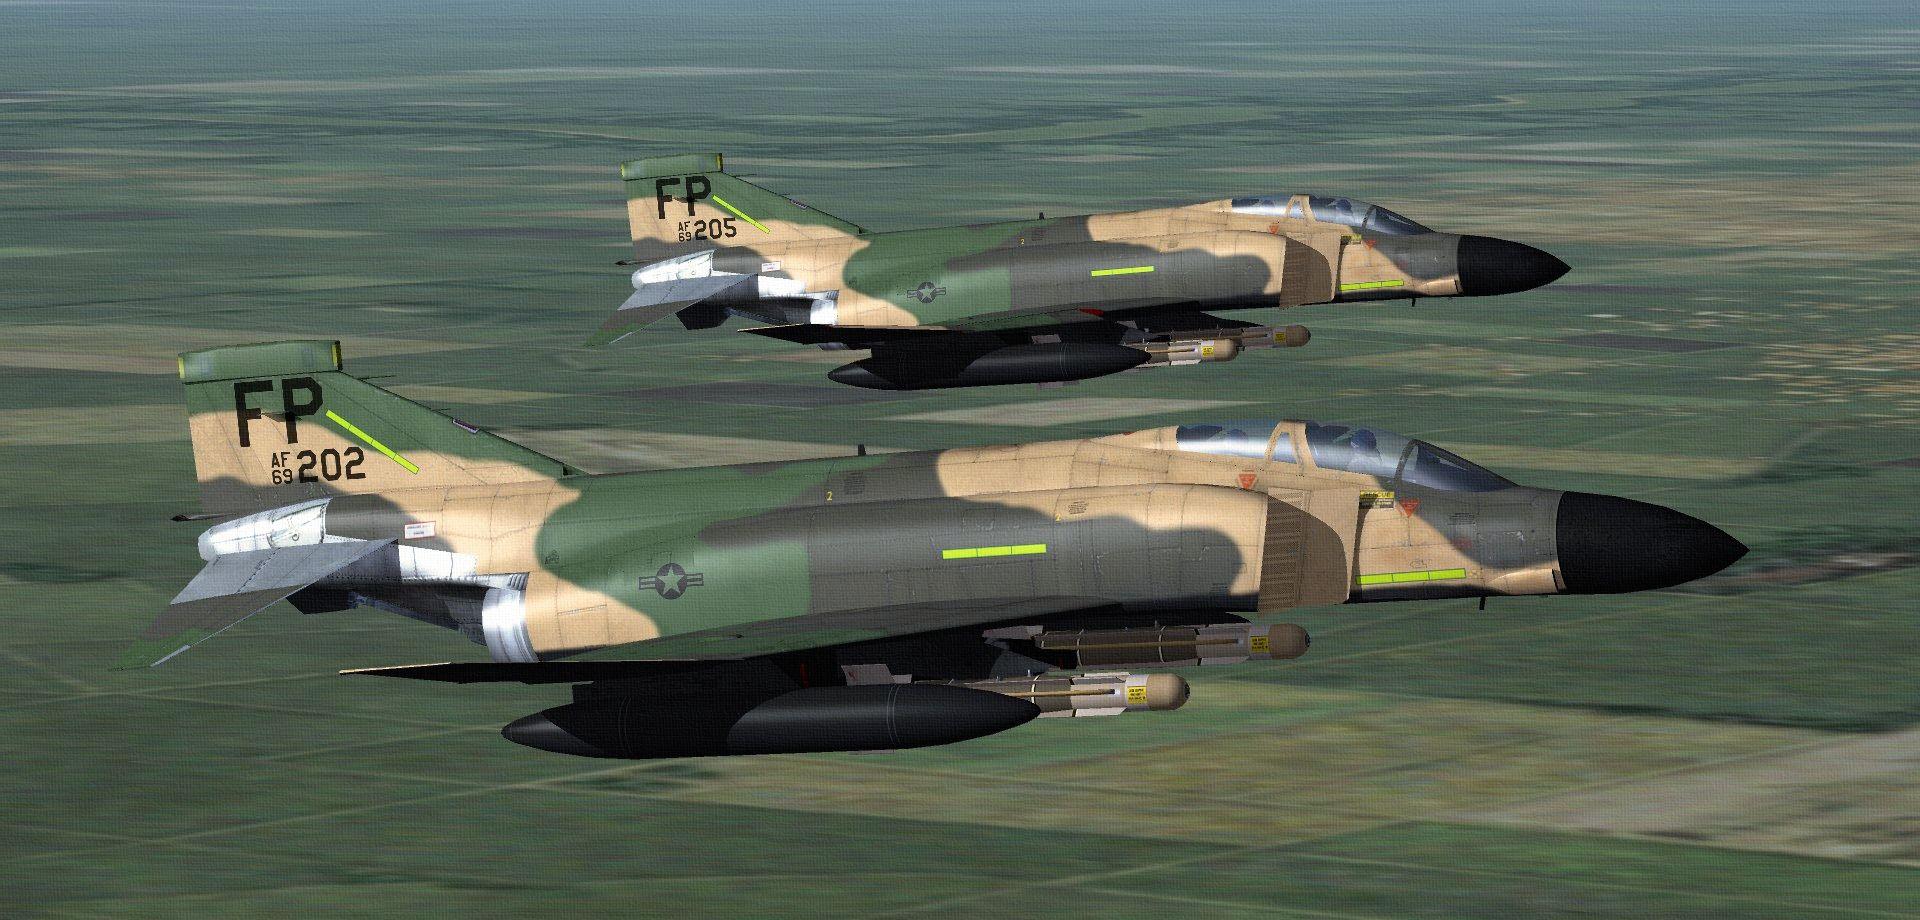 USAFF-4MPHANTOM12_zps946695c5.jpg